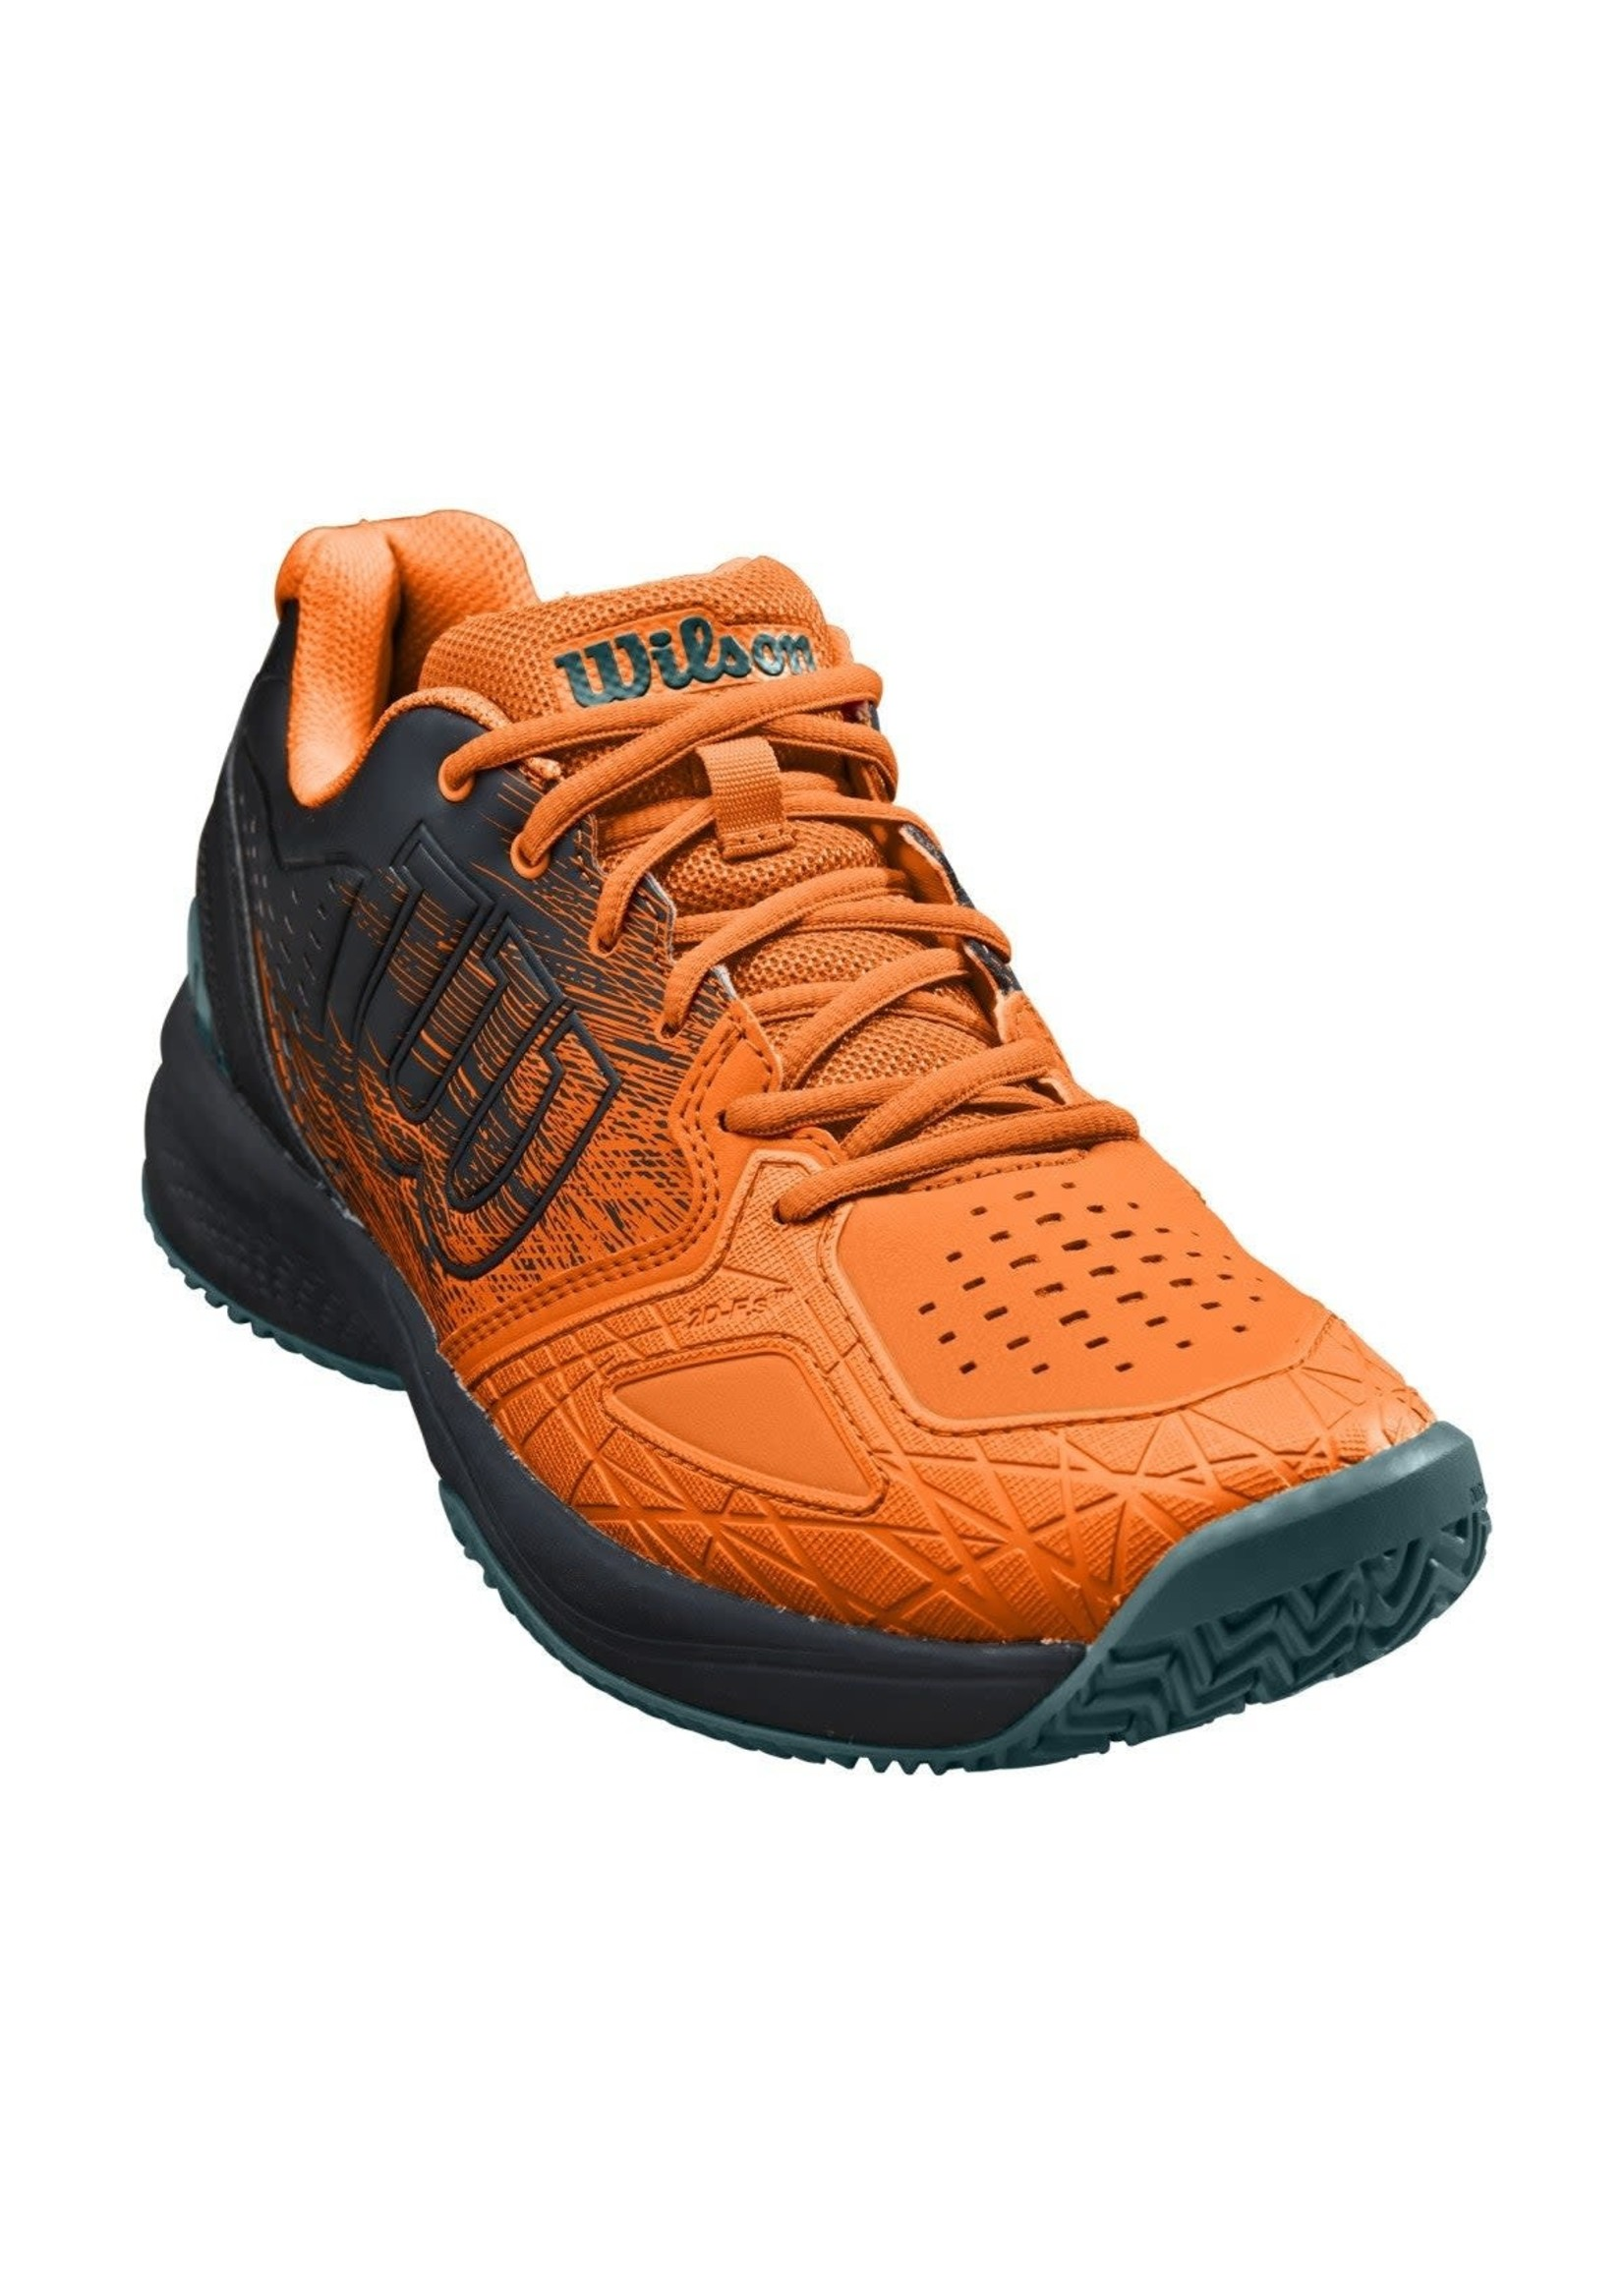 Wilson Wilson Kaos Comp 2 Mens Tennis Shoe (2021)